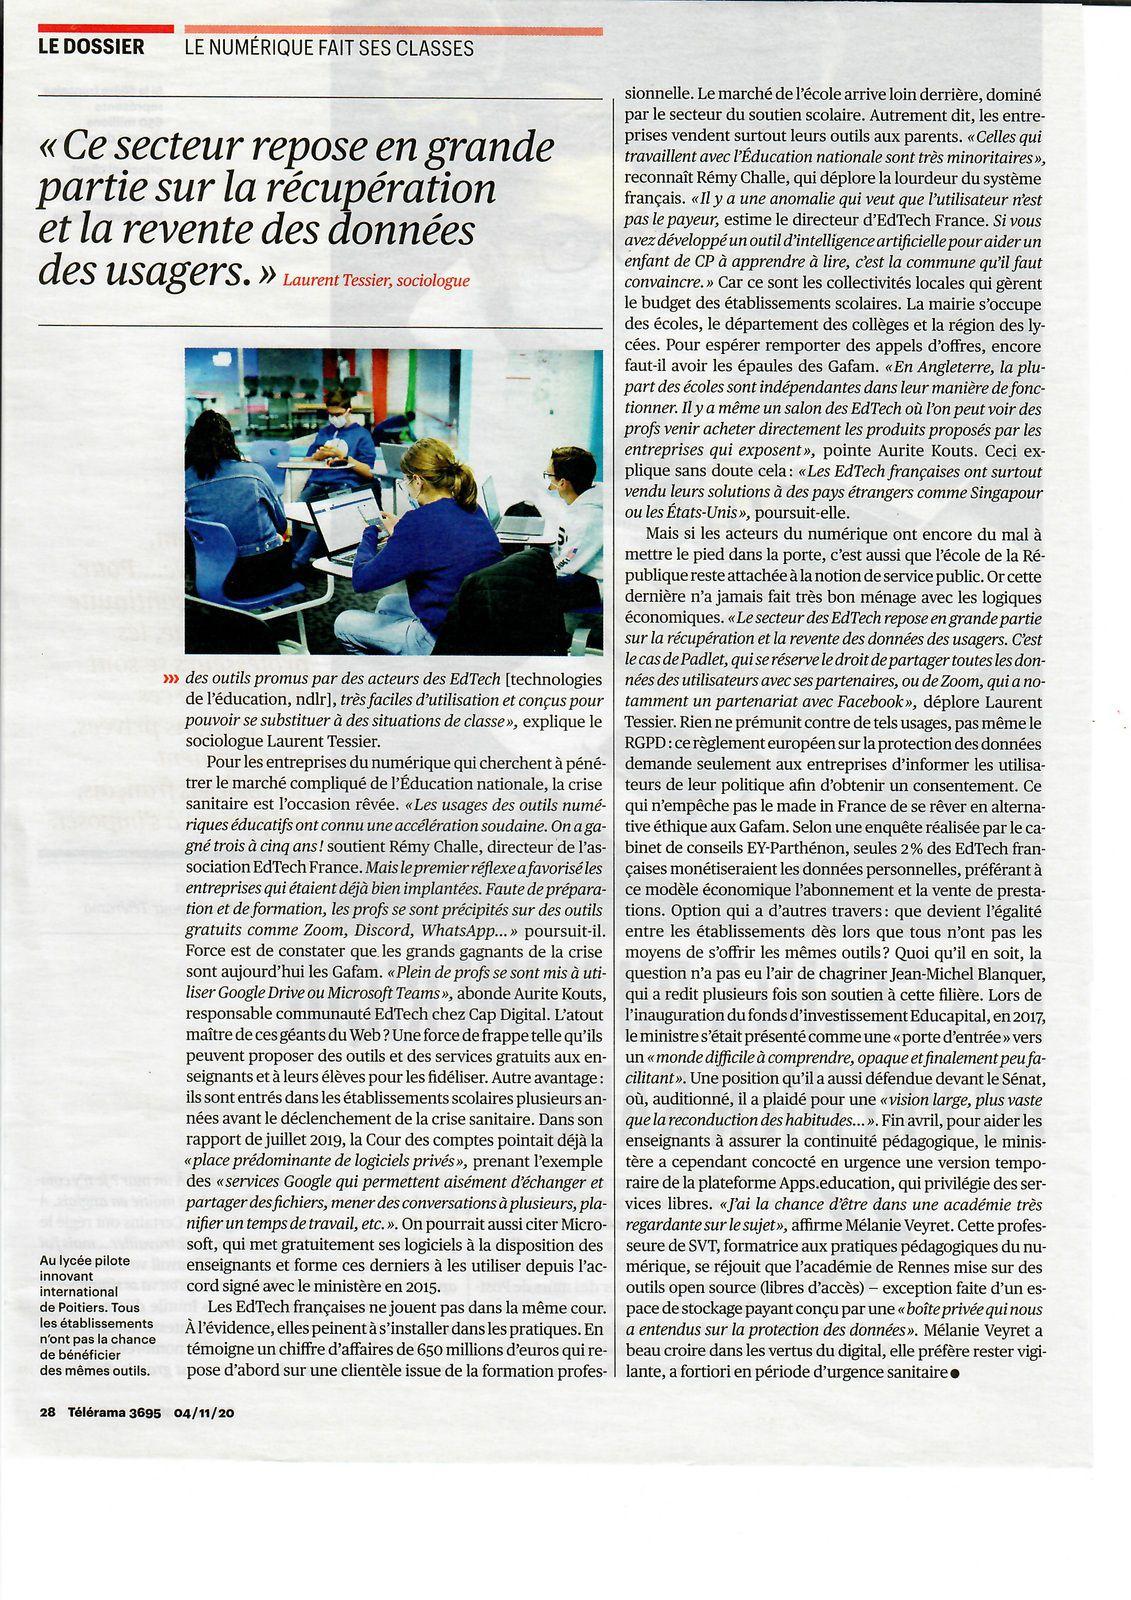 Vu et lu dans Télérama n° 3695 du 04/11/20